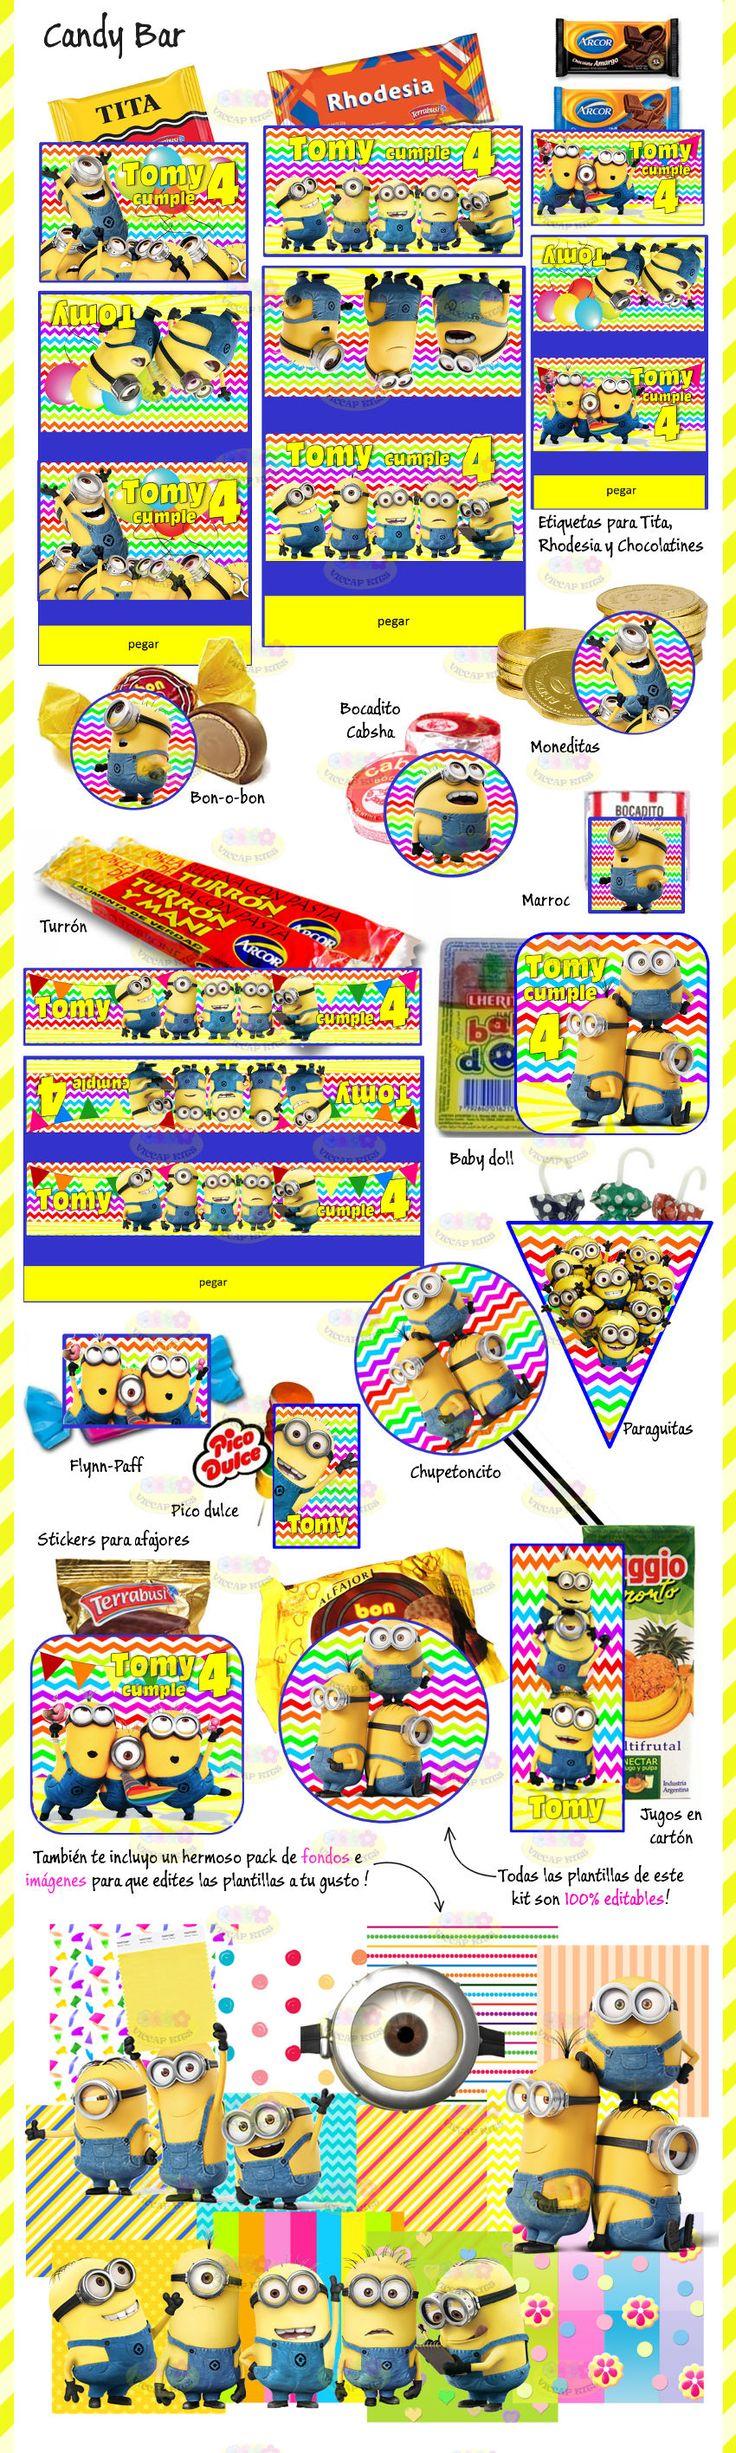 (8) Kit Imprimible Minions Mi Villano Favorito Candy Bar Invitac - $ 44,90 en MercadoLibre